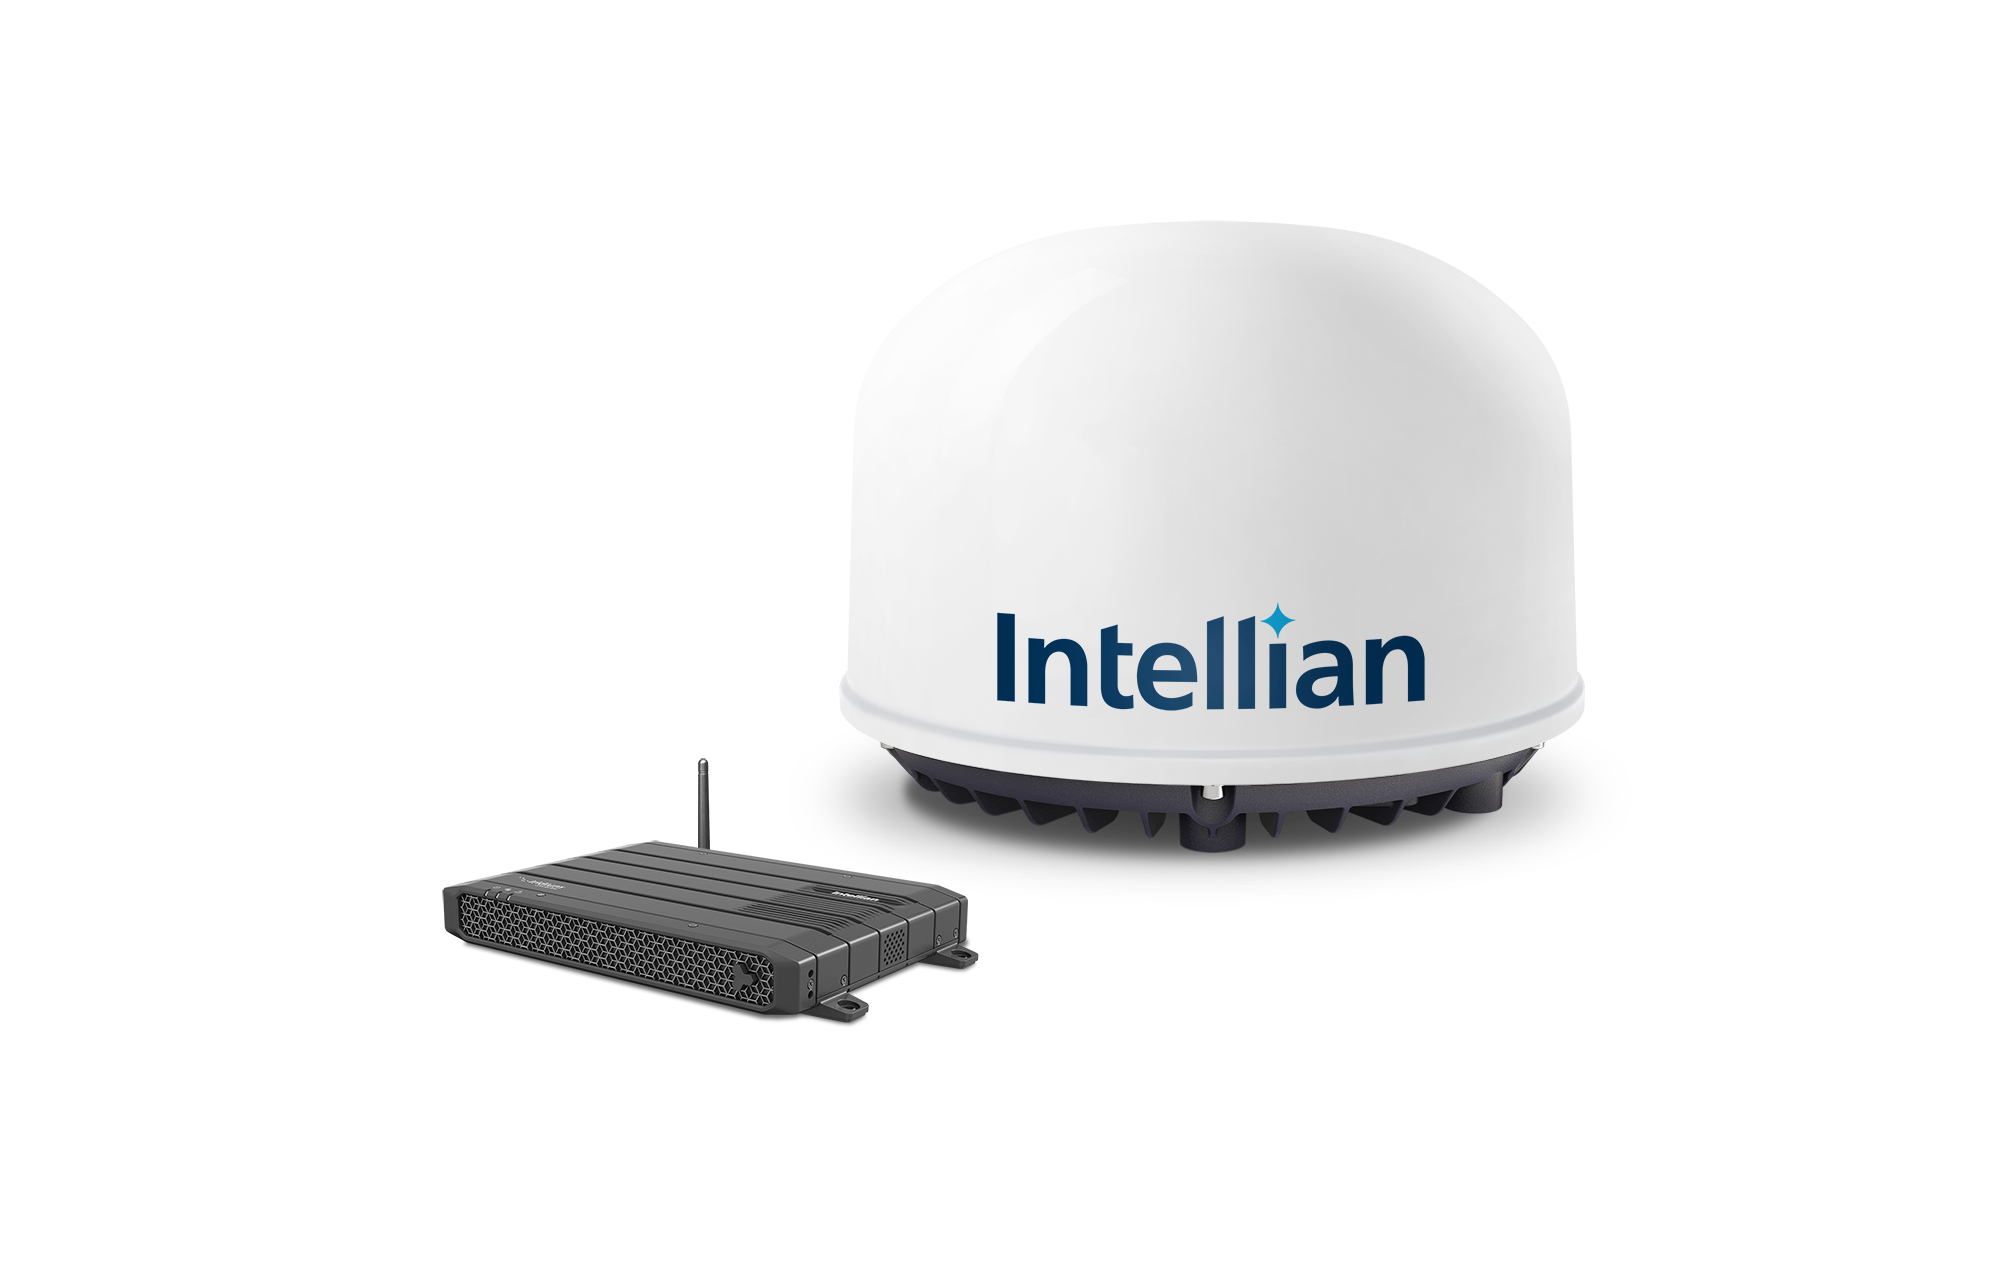 Intellian C700 Product Image